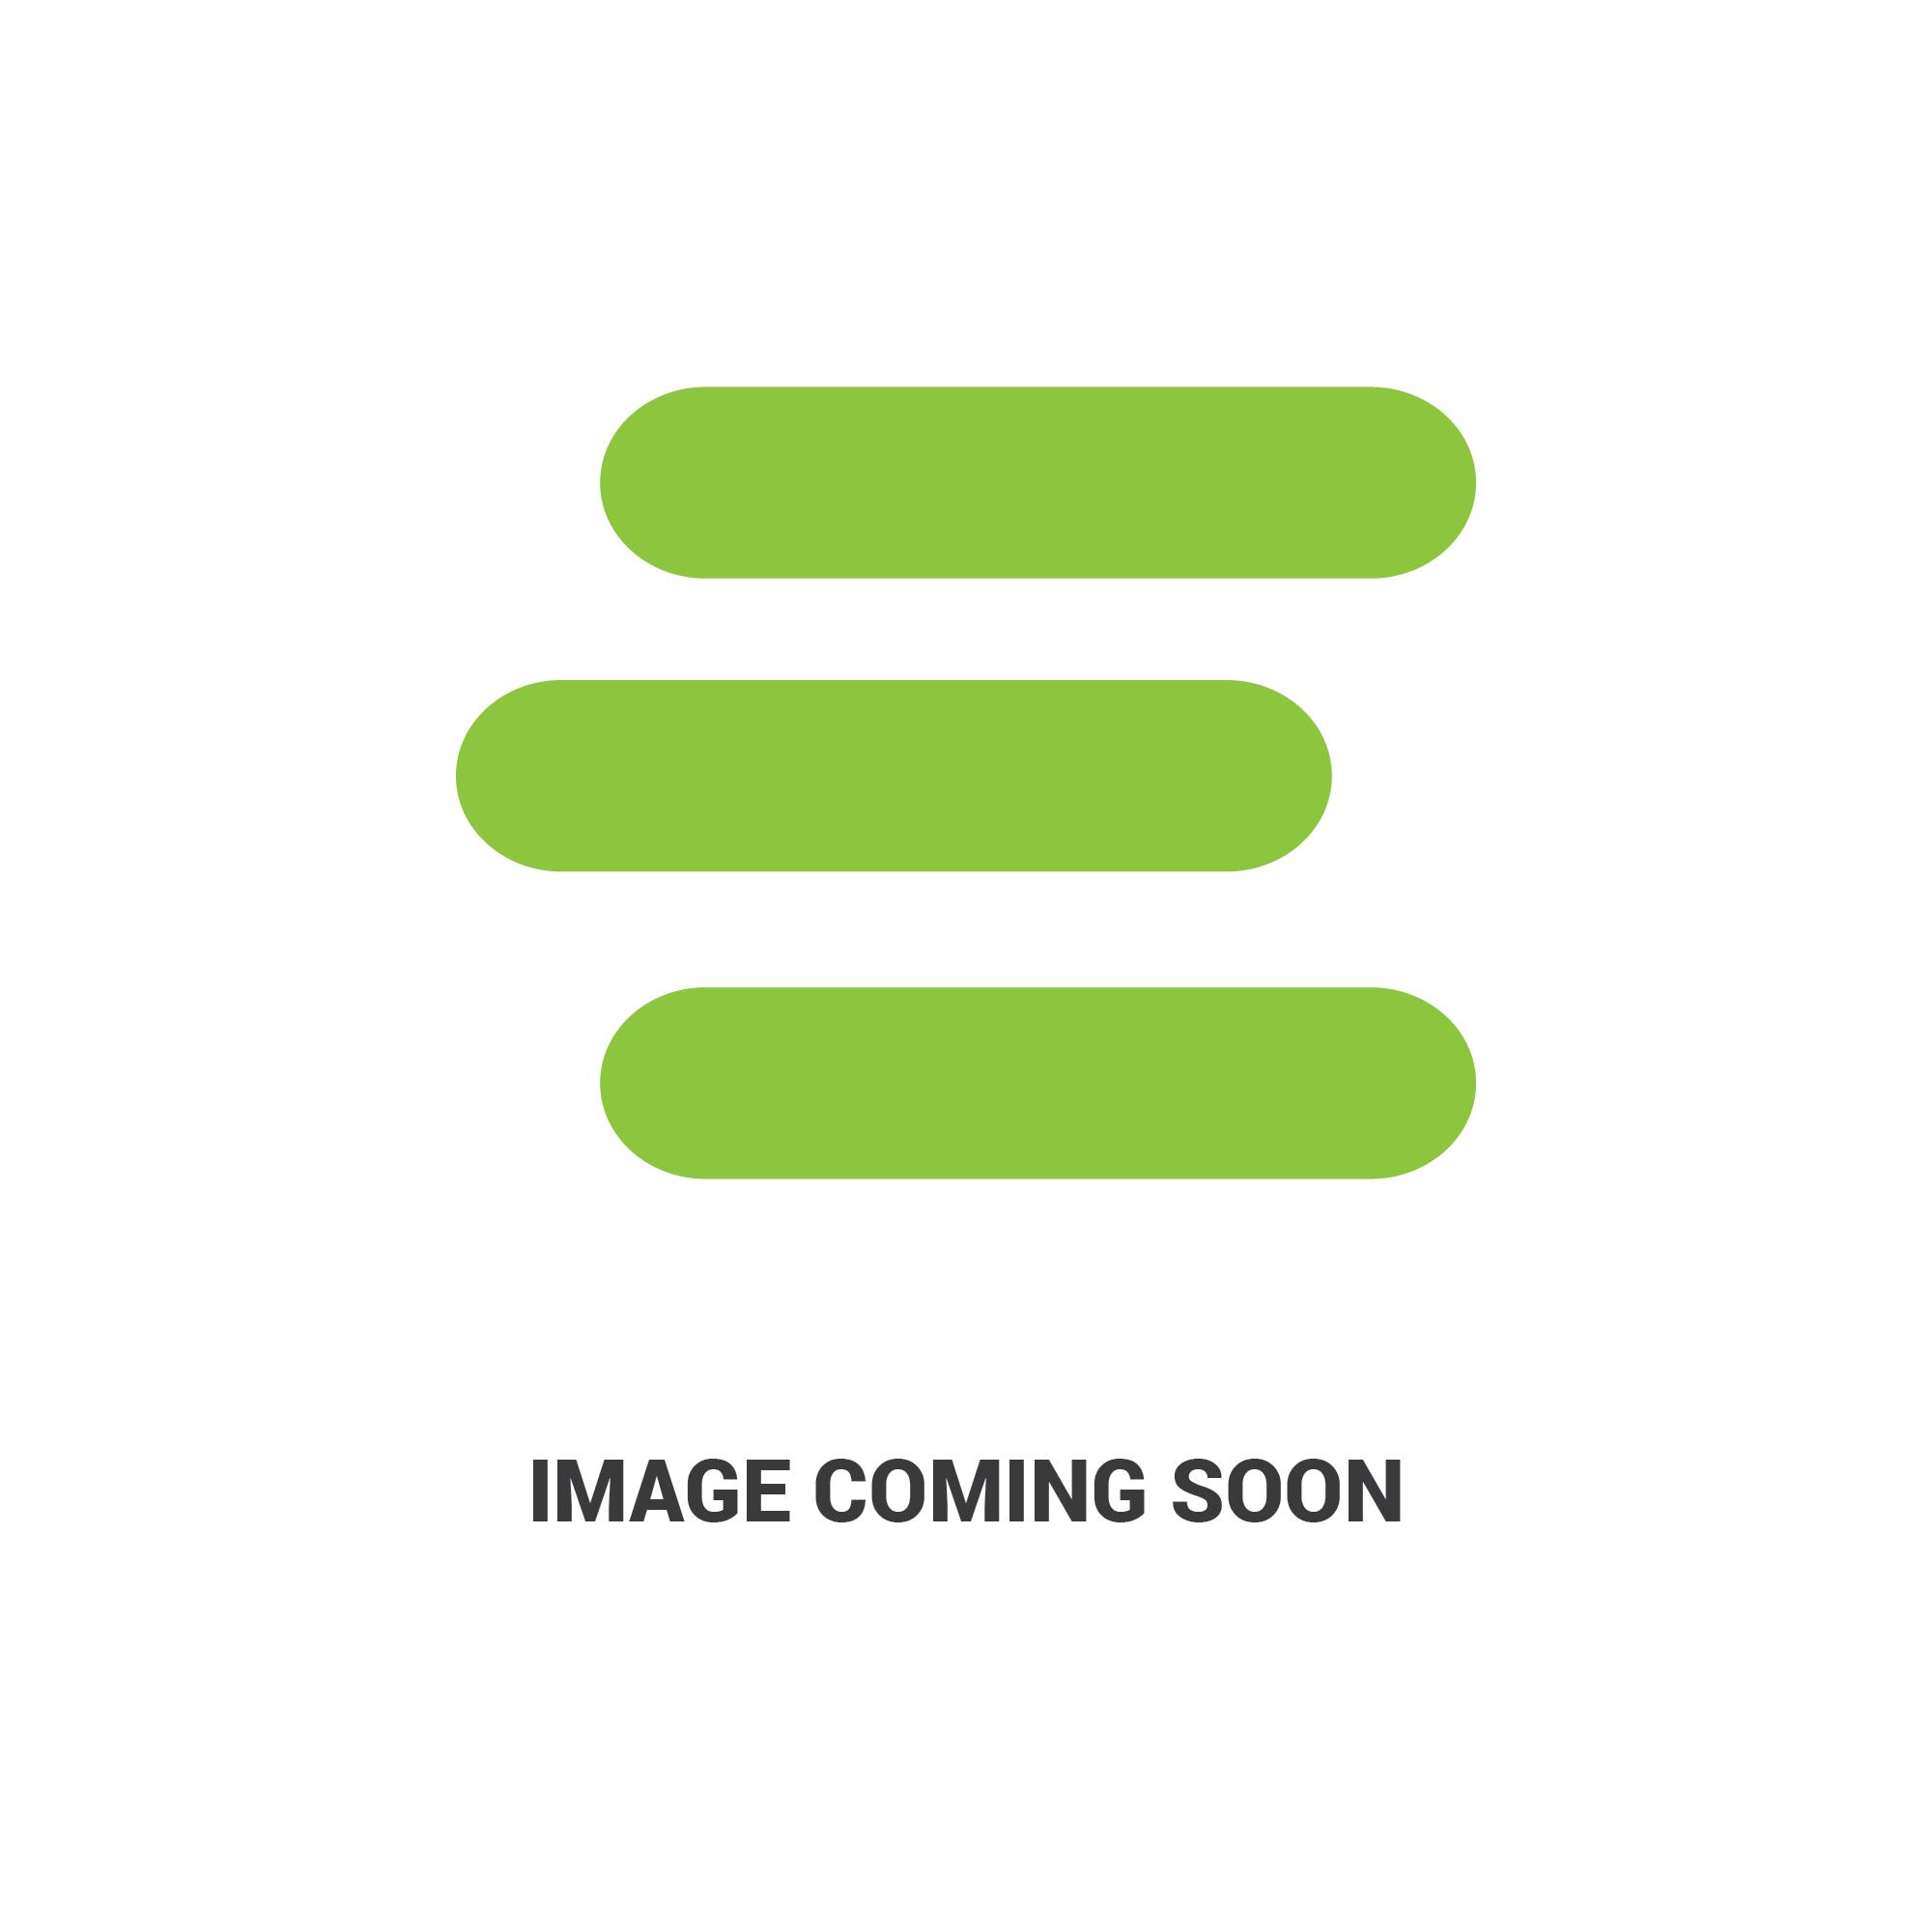 E-131673edit 1.jpg